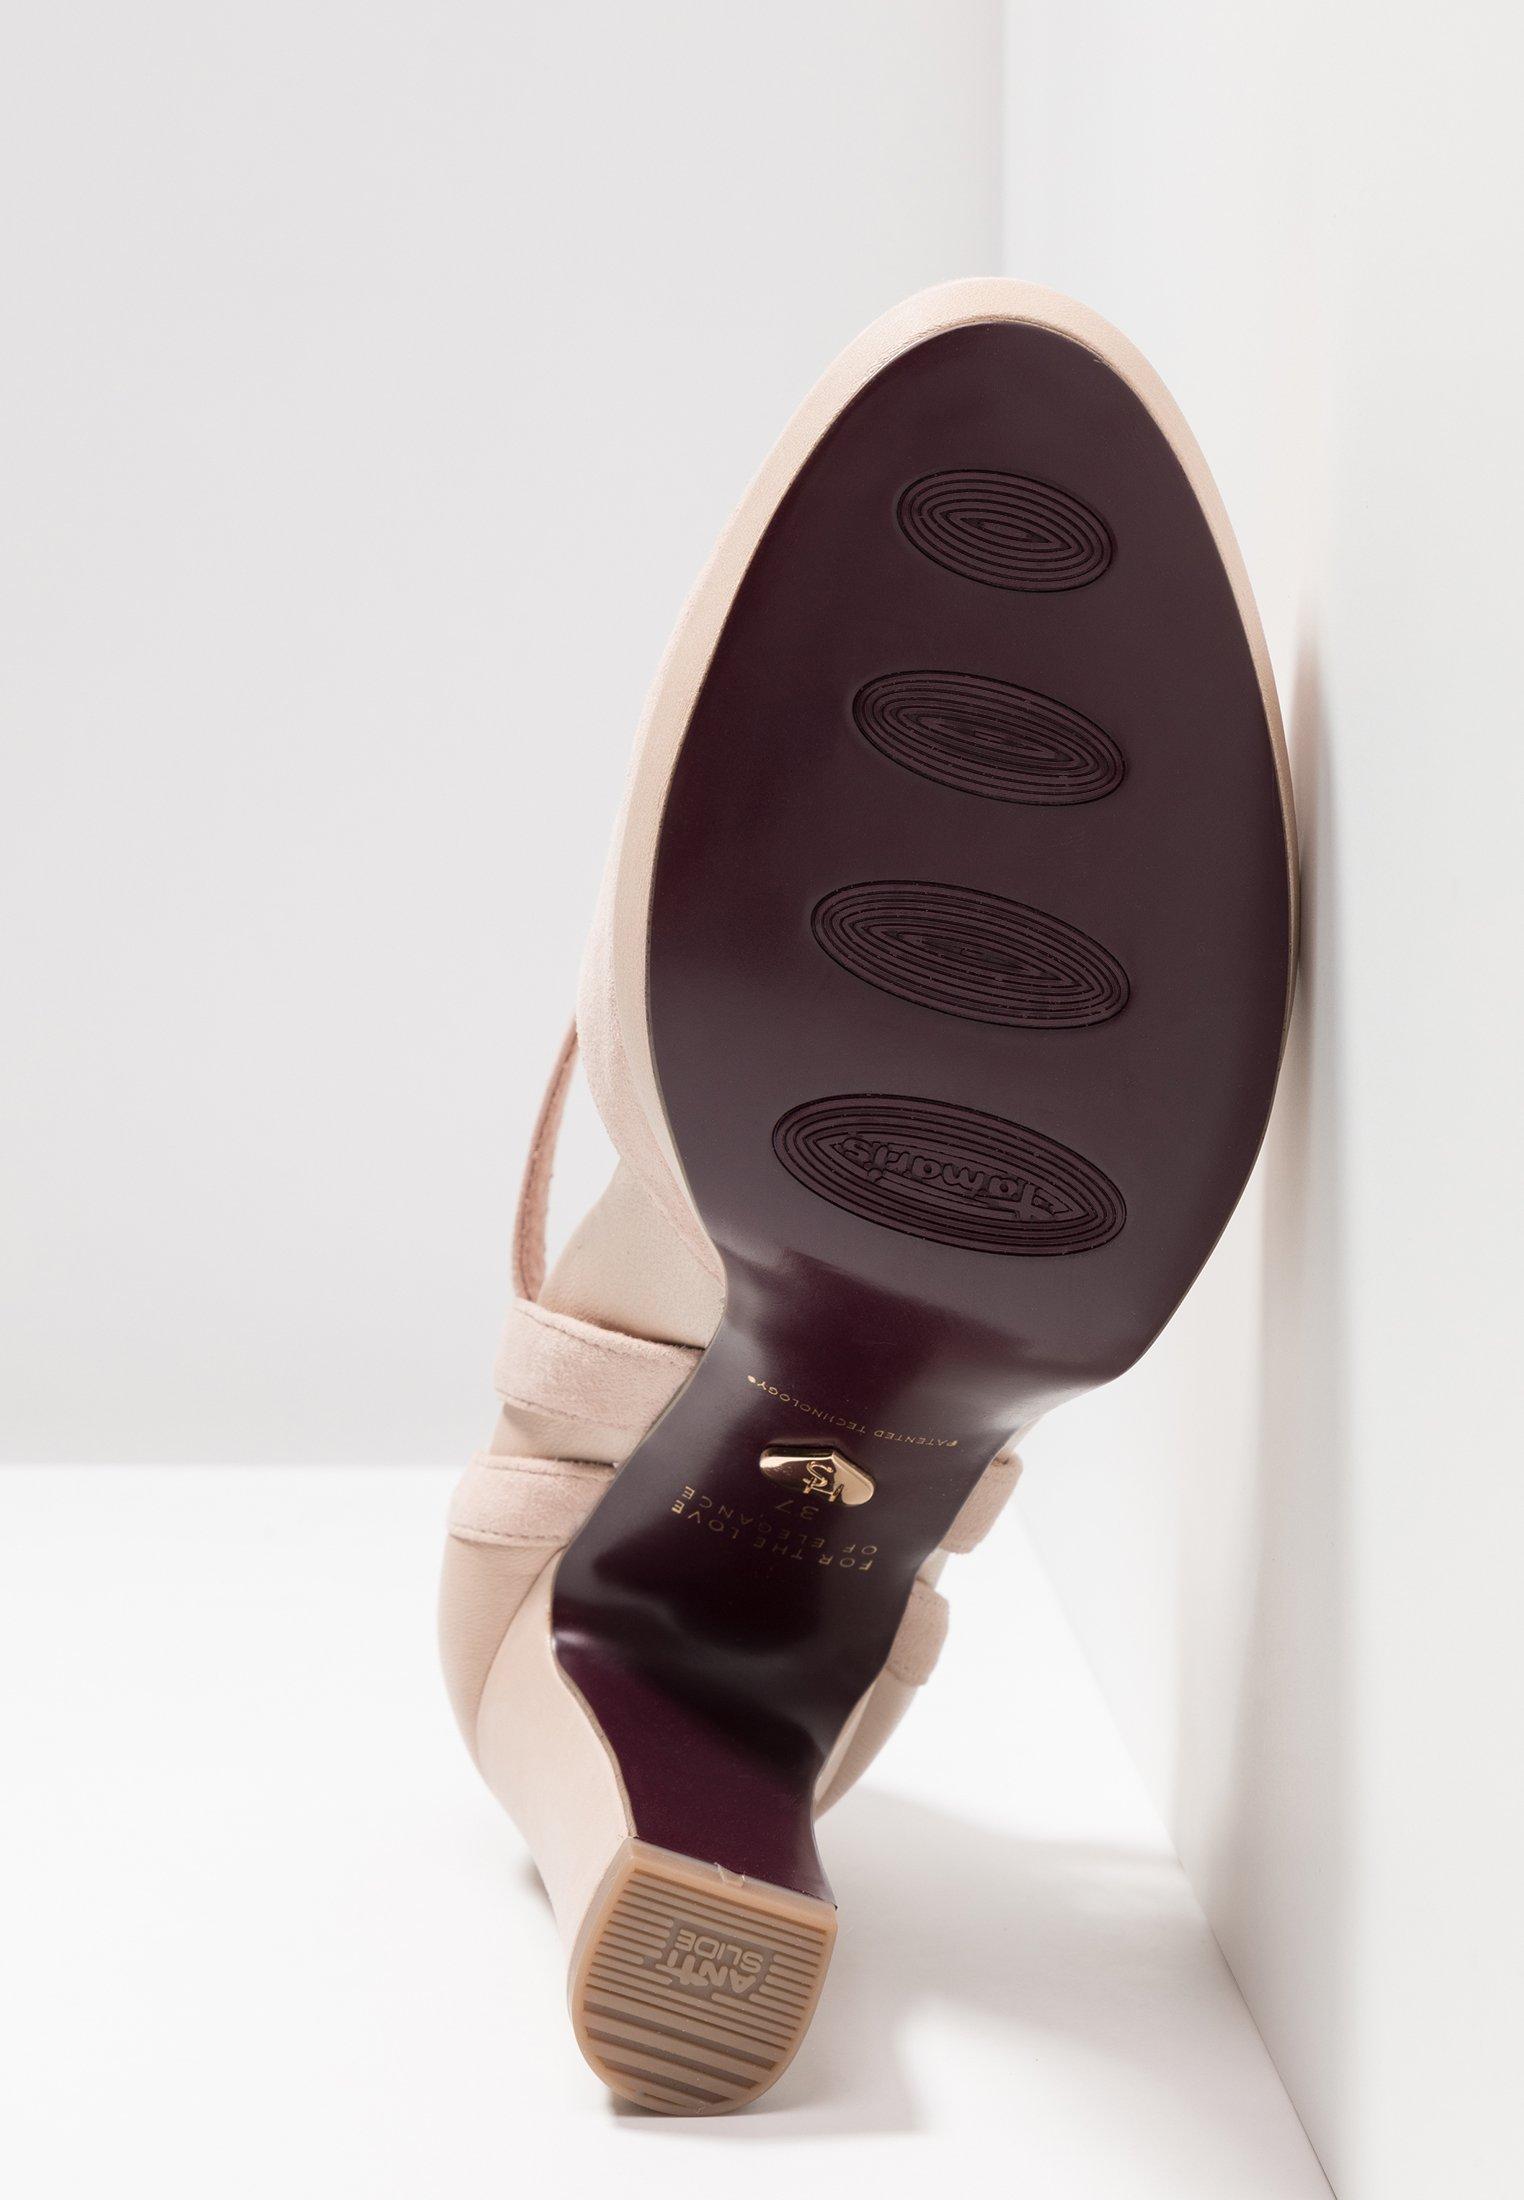 Tamaris Heart & Sole High heels - nude